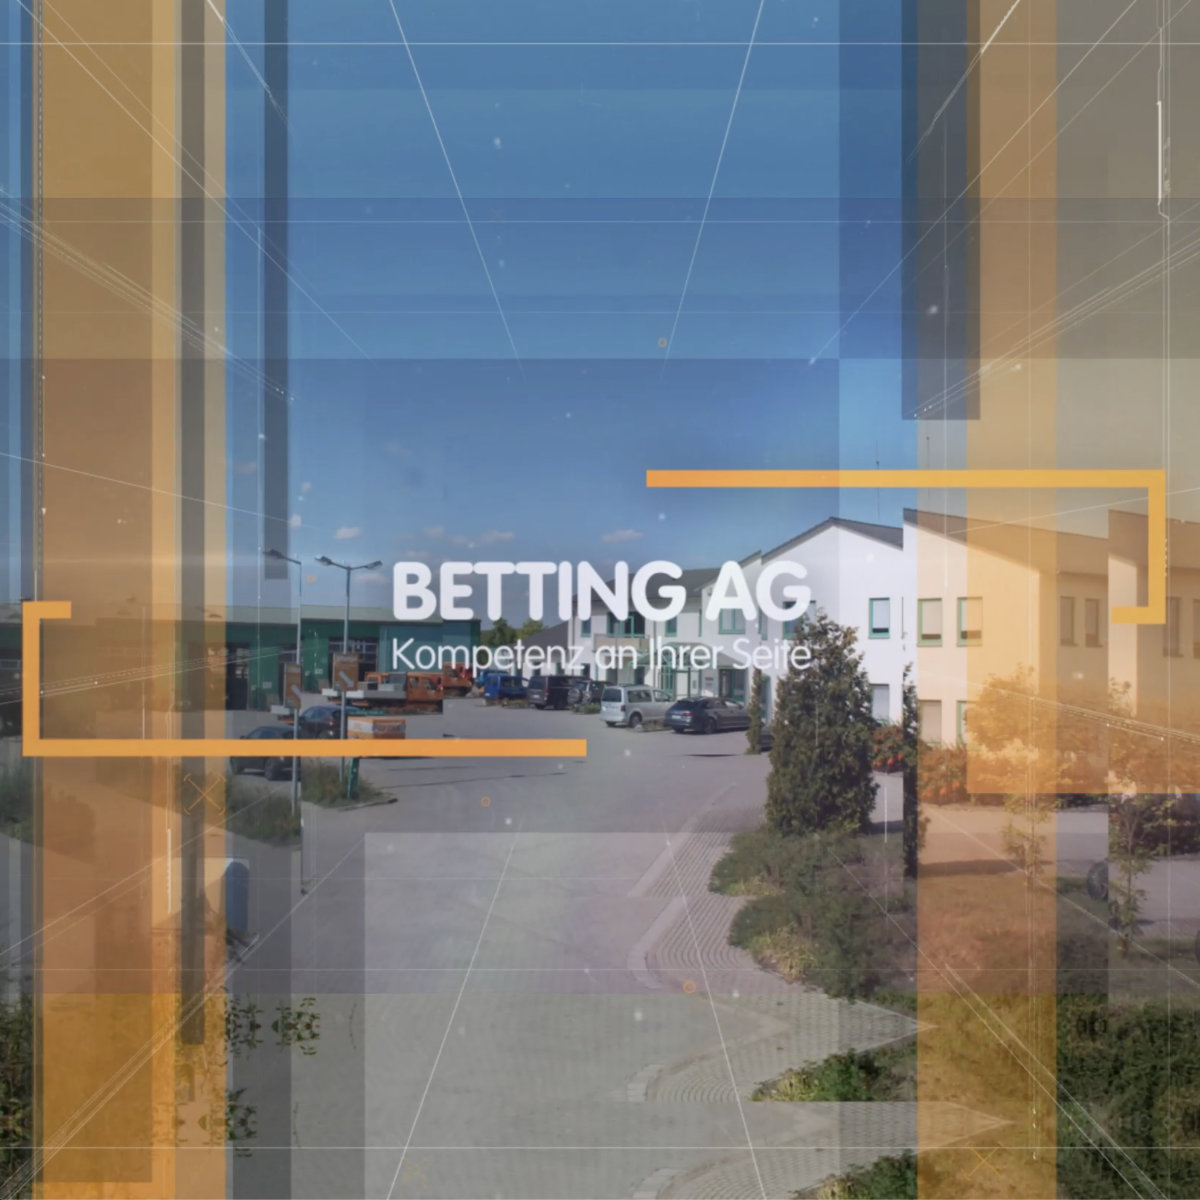 Containerdienst betting unterwellenborn germany las vegas sports betting account